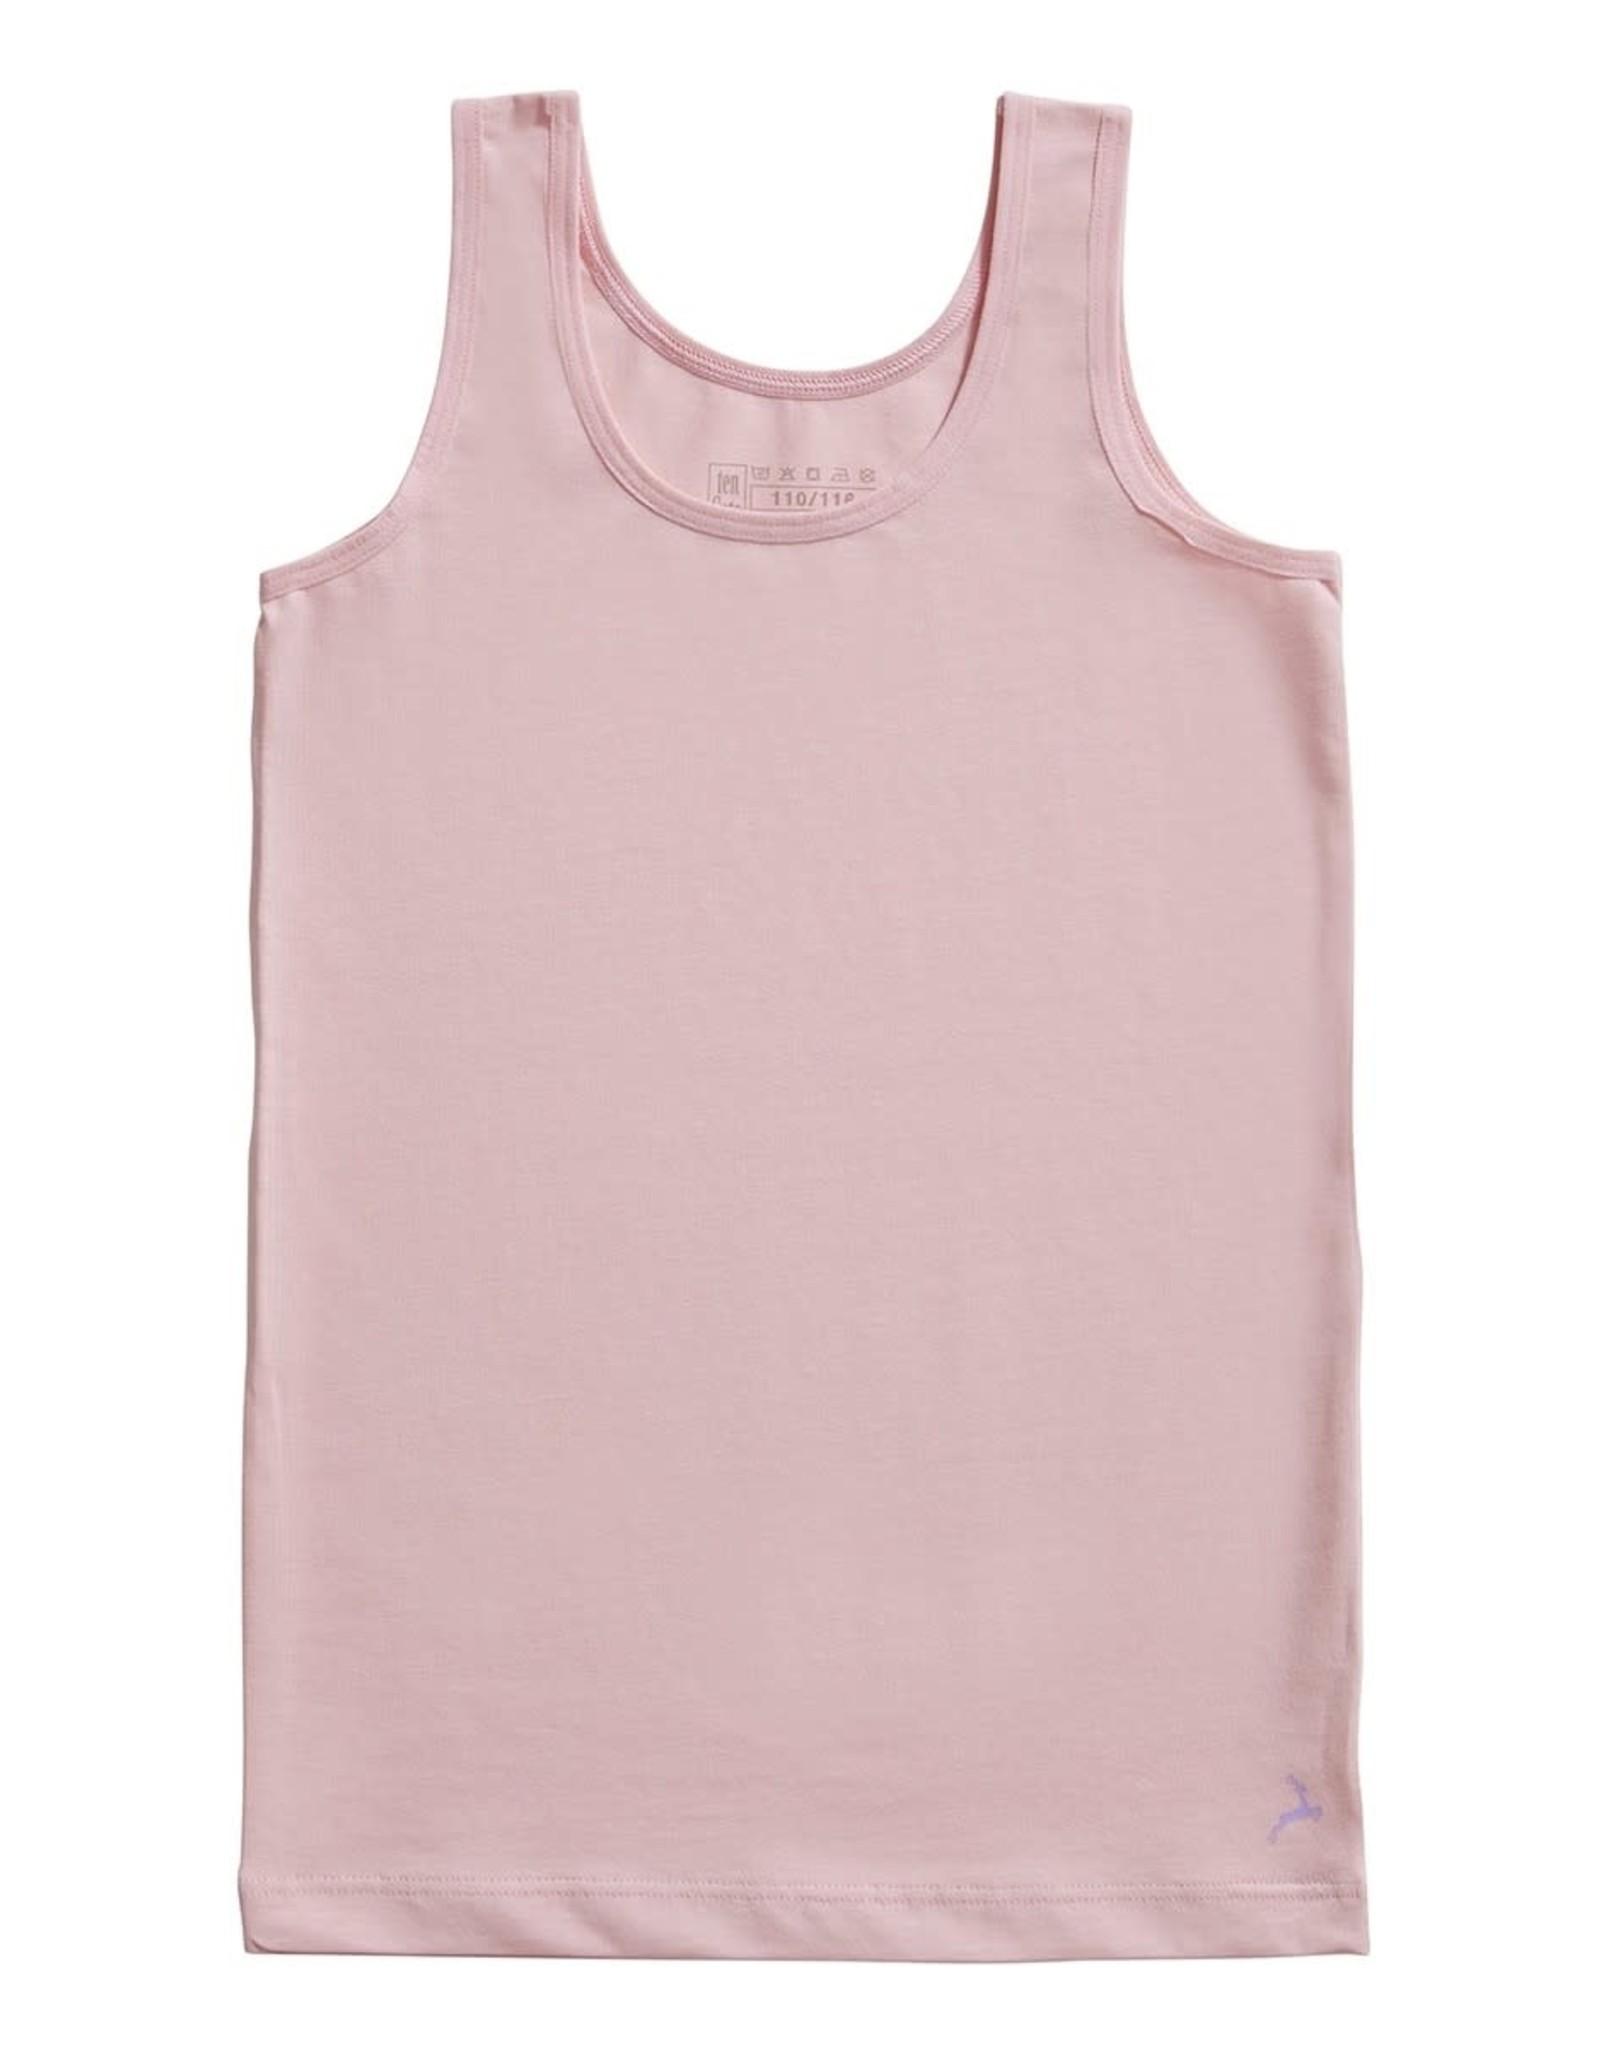 Ten Cate Basic girls shirt candy pink